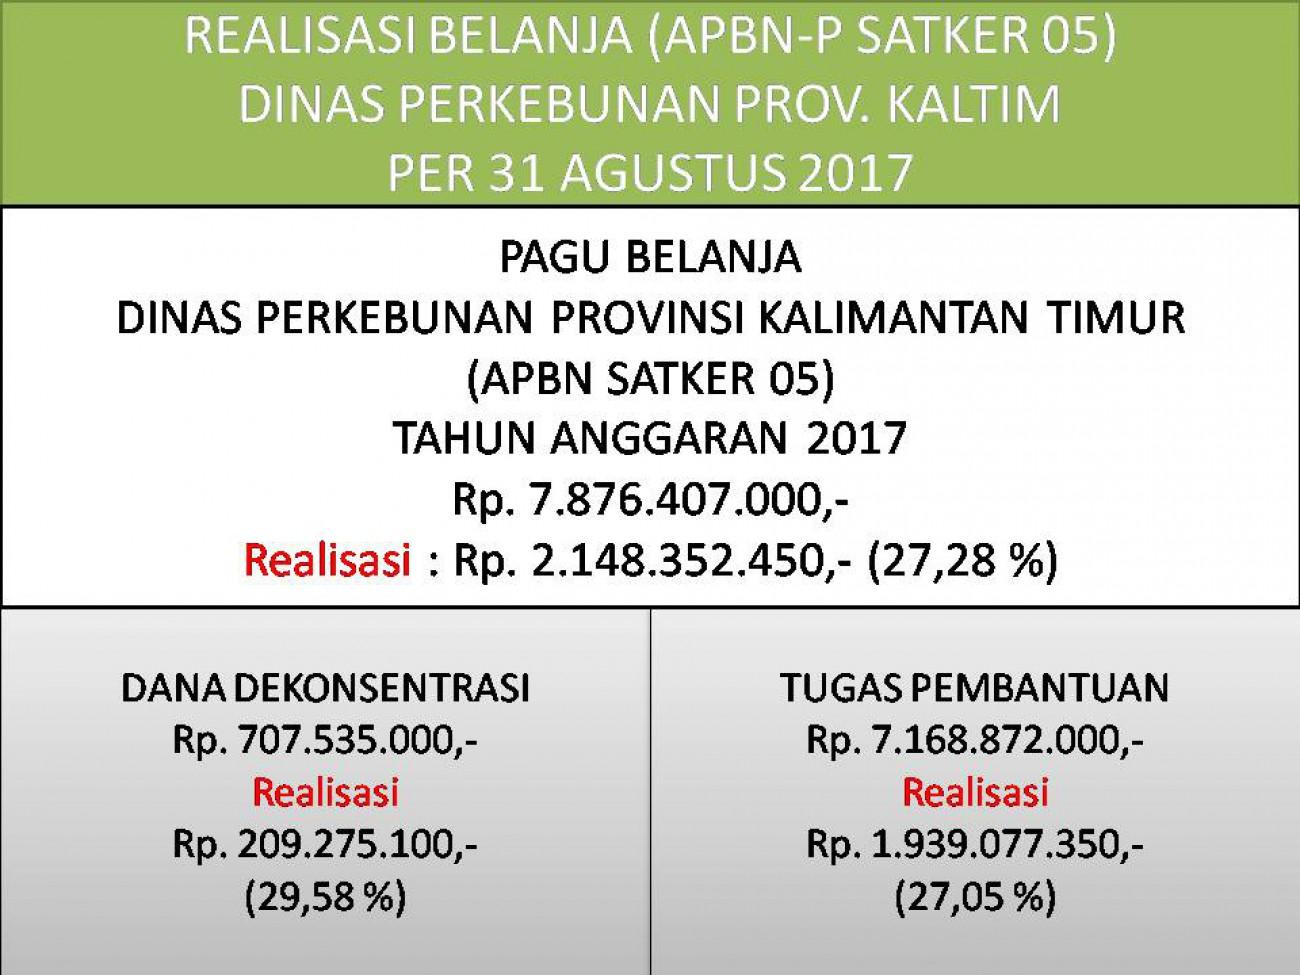 Laporan Realisasi APBN-P Satker 05 (Direktorat Jenderal Perkebunan) Dinas Perkebunan Prov. Kaltim Bulan Agustus 2017